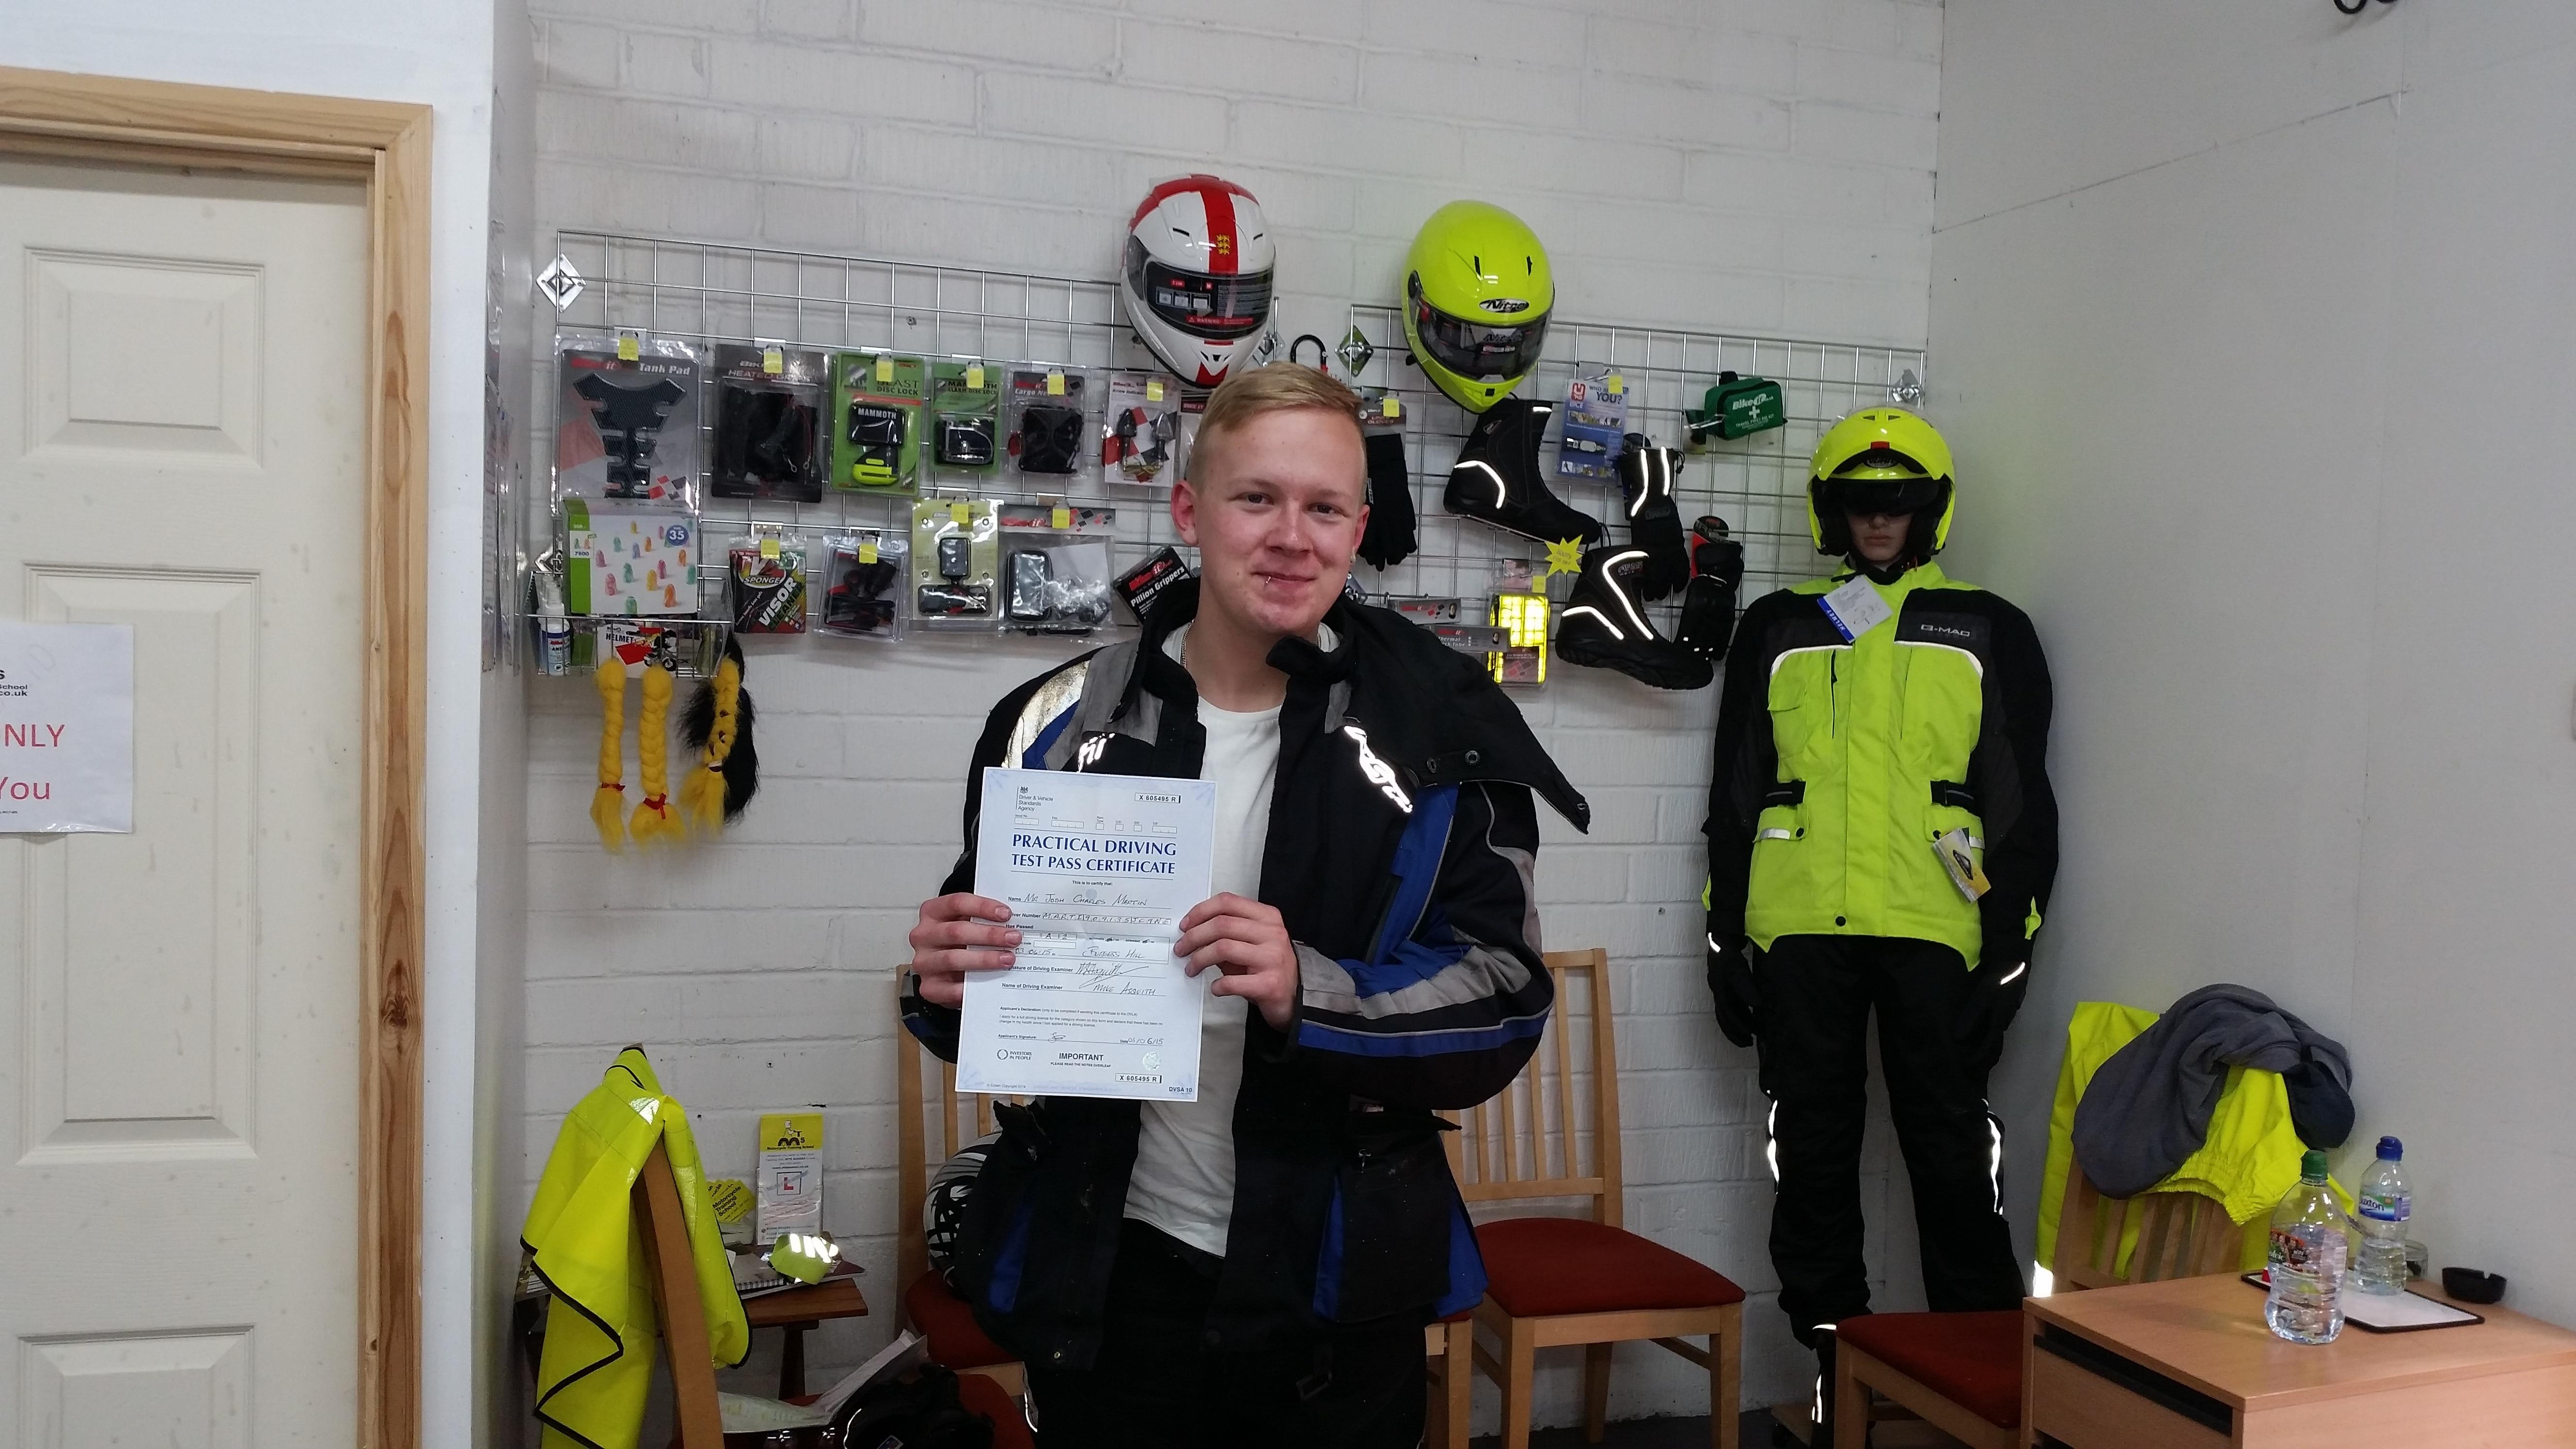 Jolly Josh Martin showing off his pass certificate.